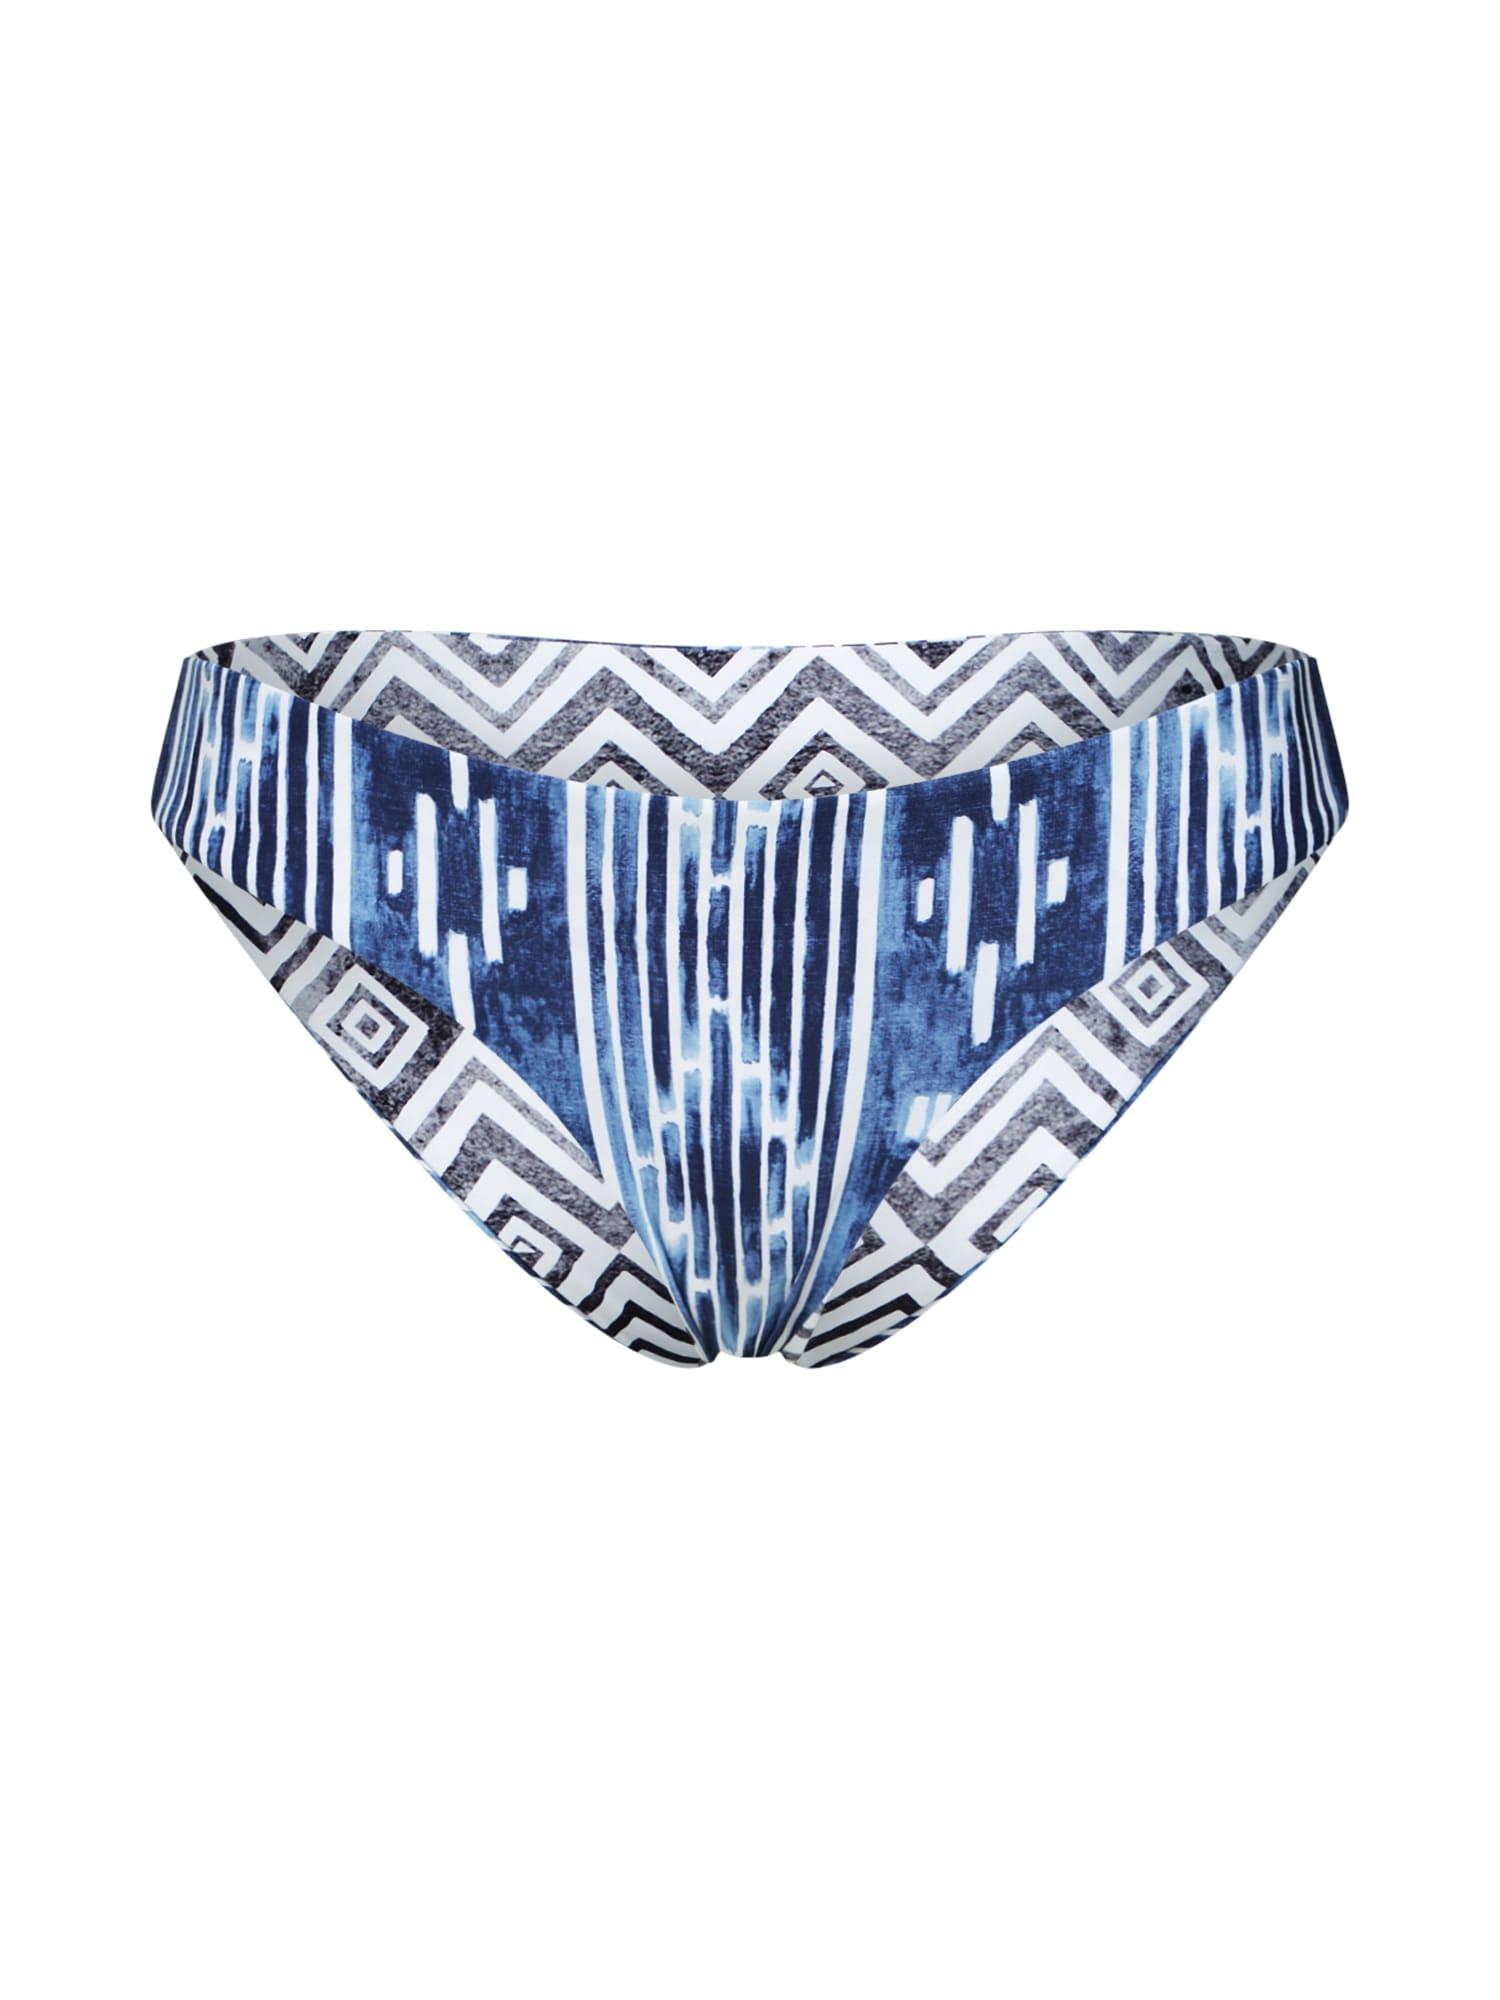 Spodní díl plavek MOON TIDE REVO GOOD modrá bílá RIP CURL